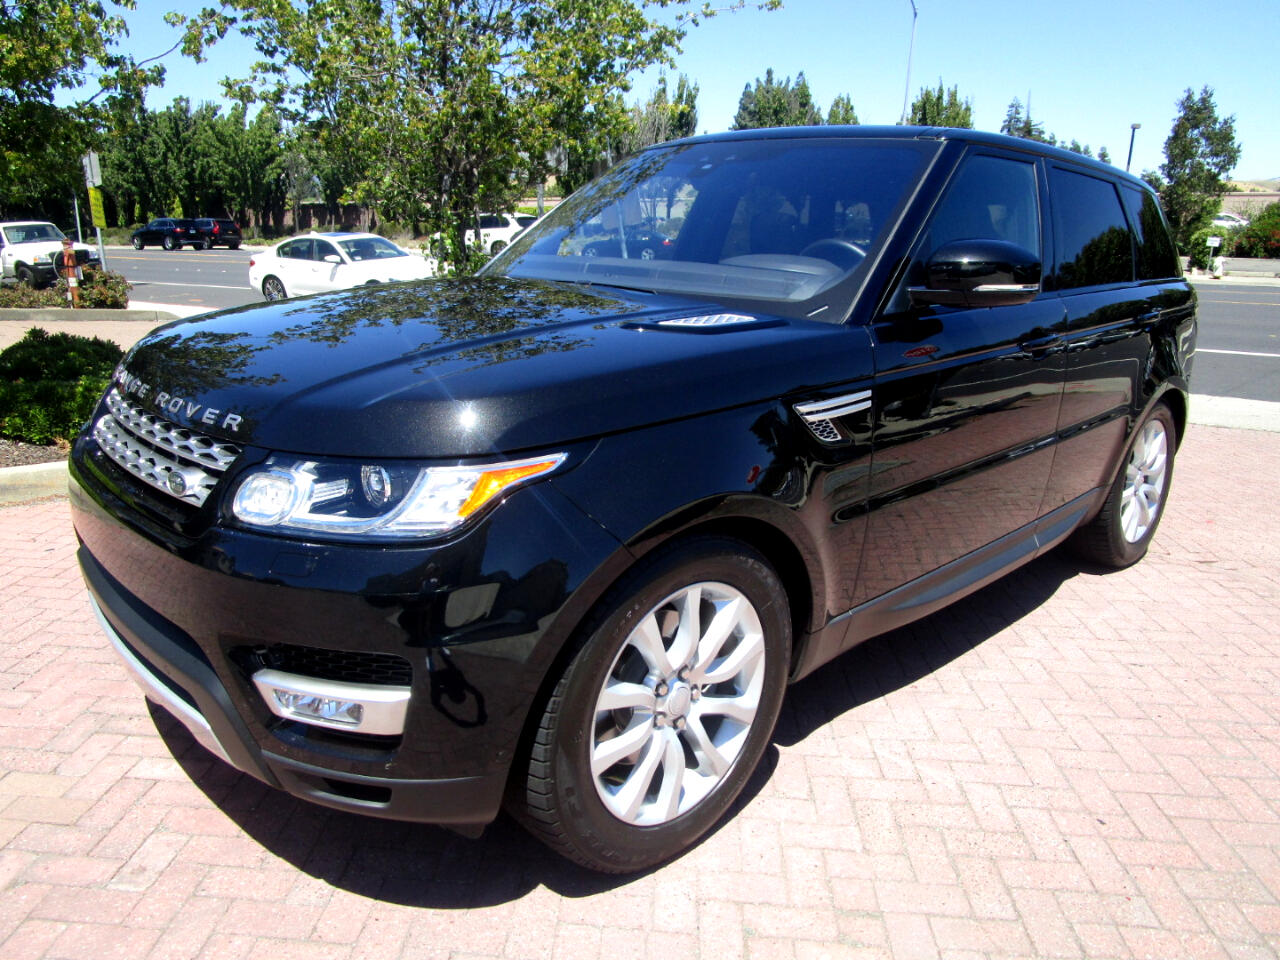 2017 Land Rover Range Rover Sport TD6 HSE DIESEL**HEAT/AC SEATS*REAR HEAT SEATS*BLND